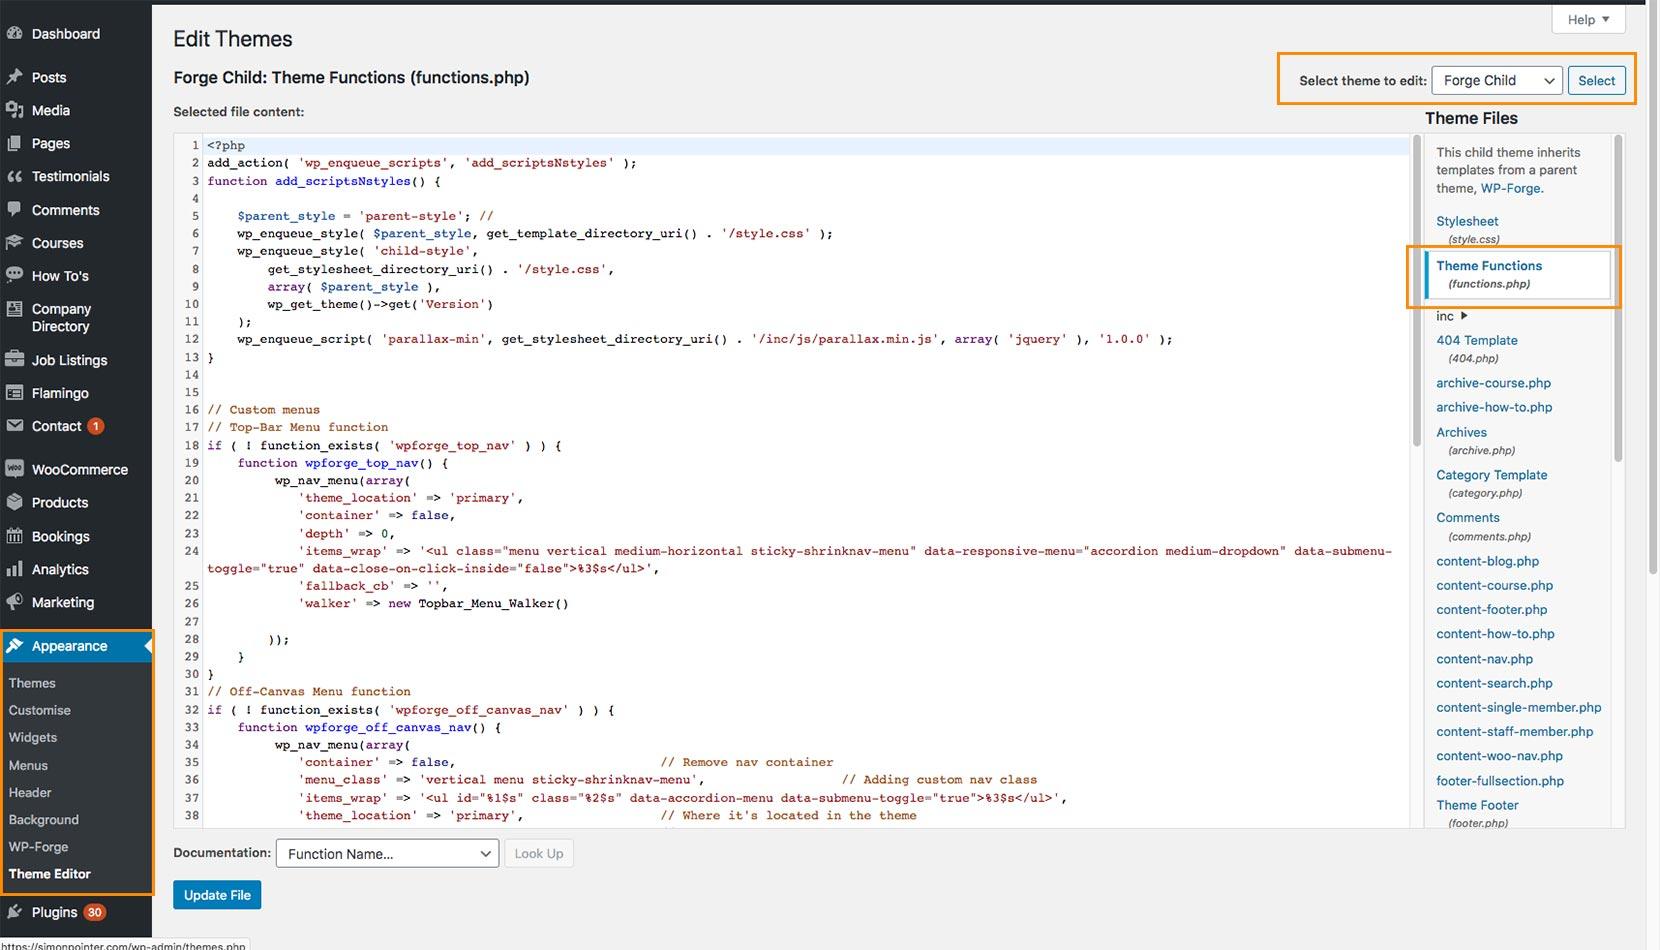 Screen shot showing edit WordPress theme functions via admin